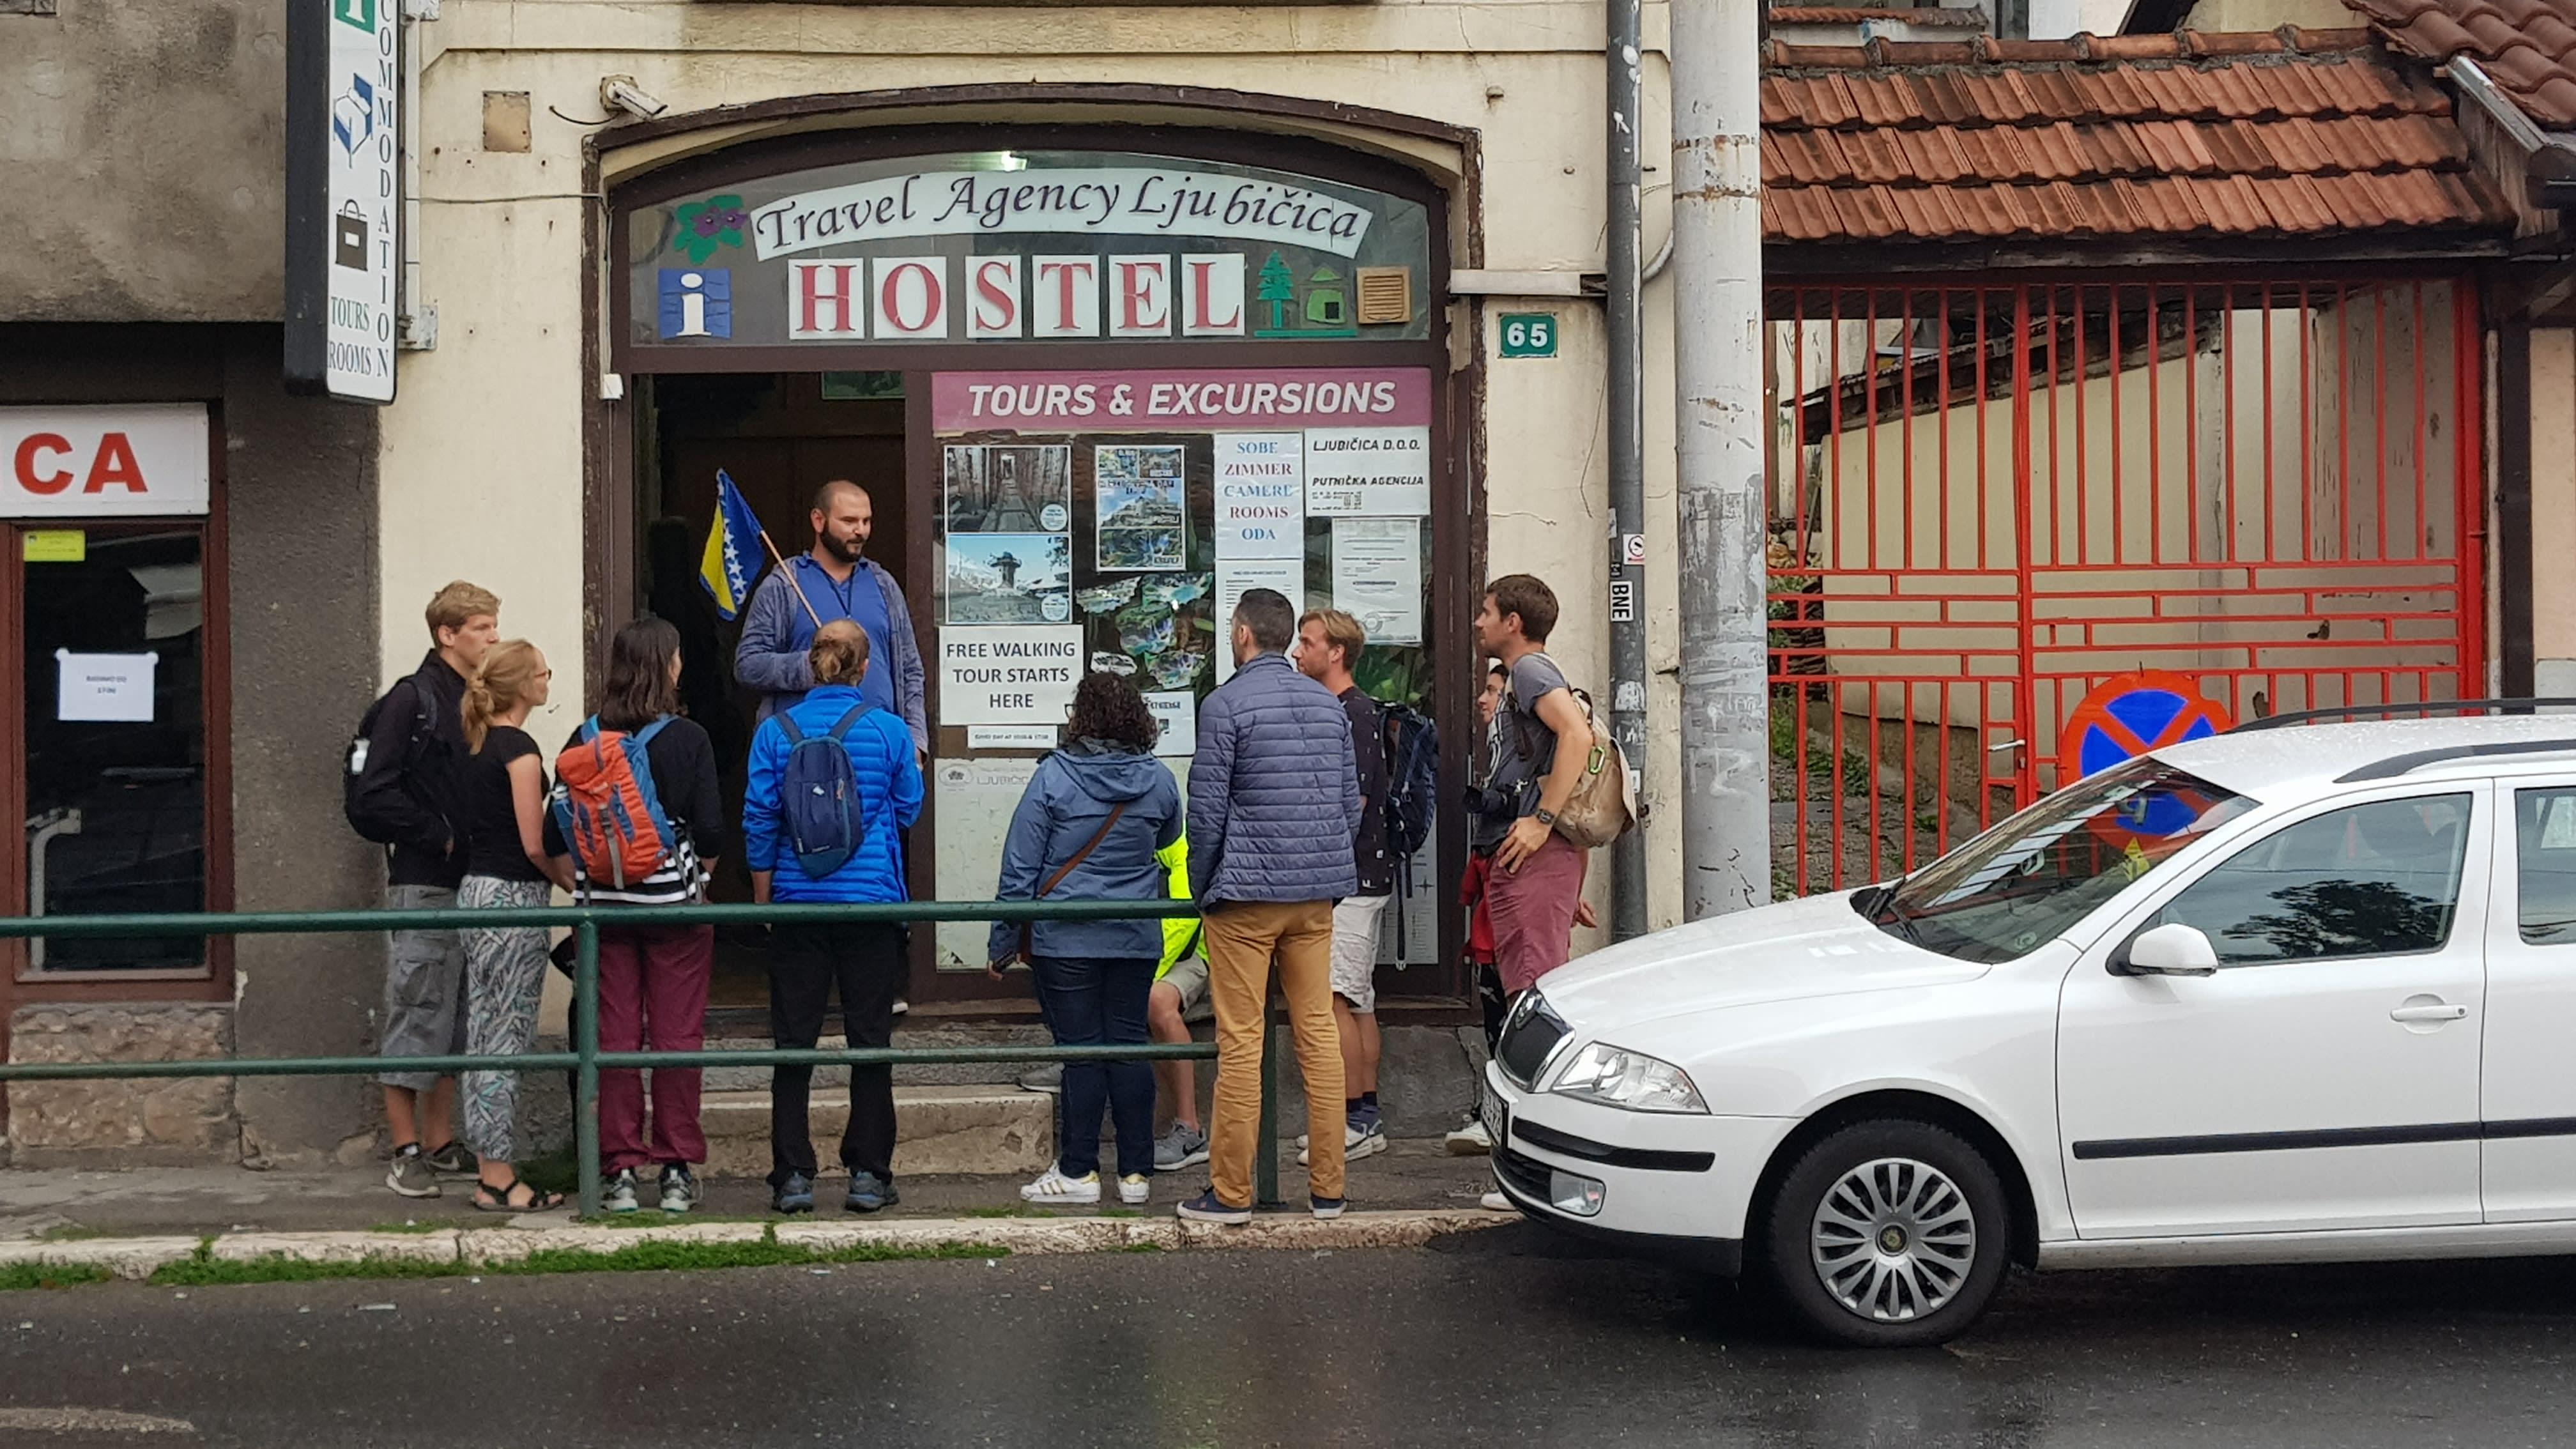 HOSTEL - Hostel Ljubicica